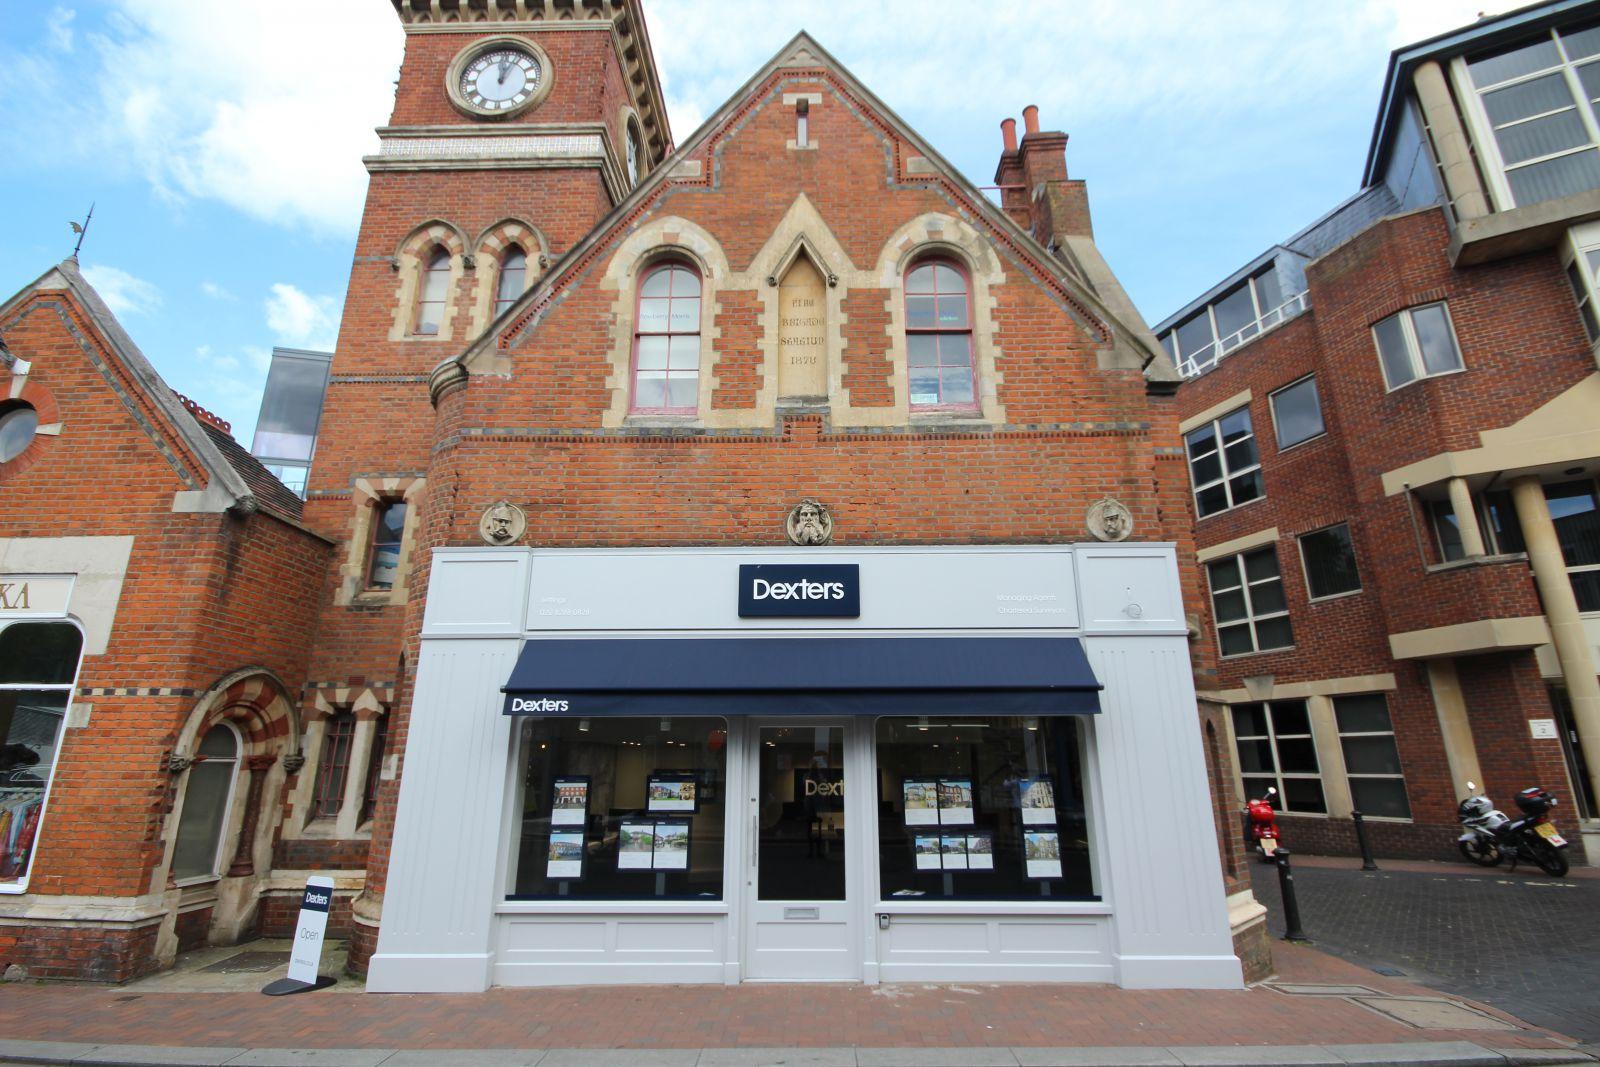 Dexters Estate Agents in Richmond - Richmond, London TW9 1AD - 020 8288 9988 | ShowMeLocal.com